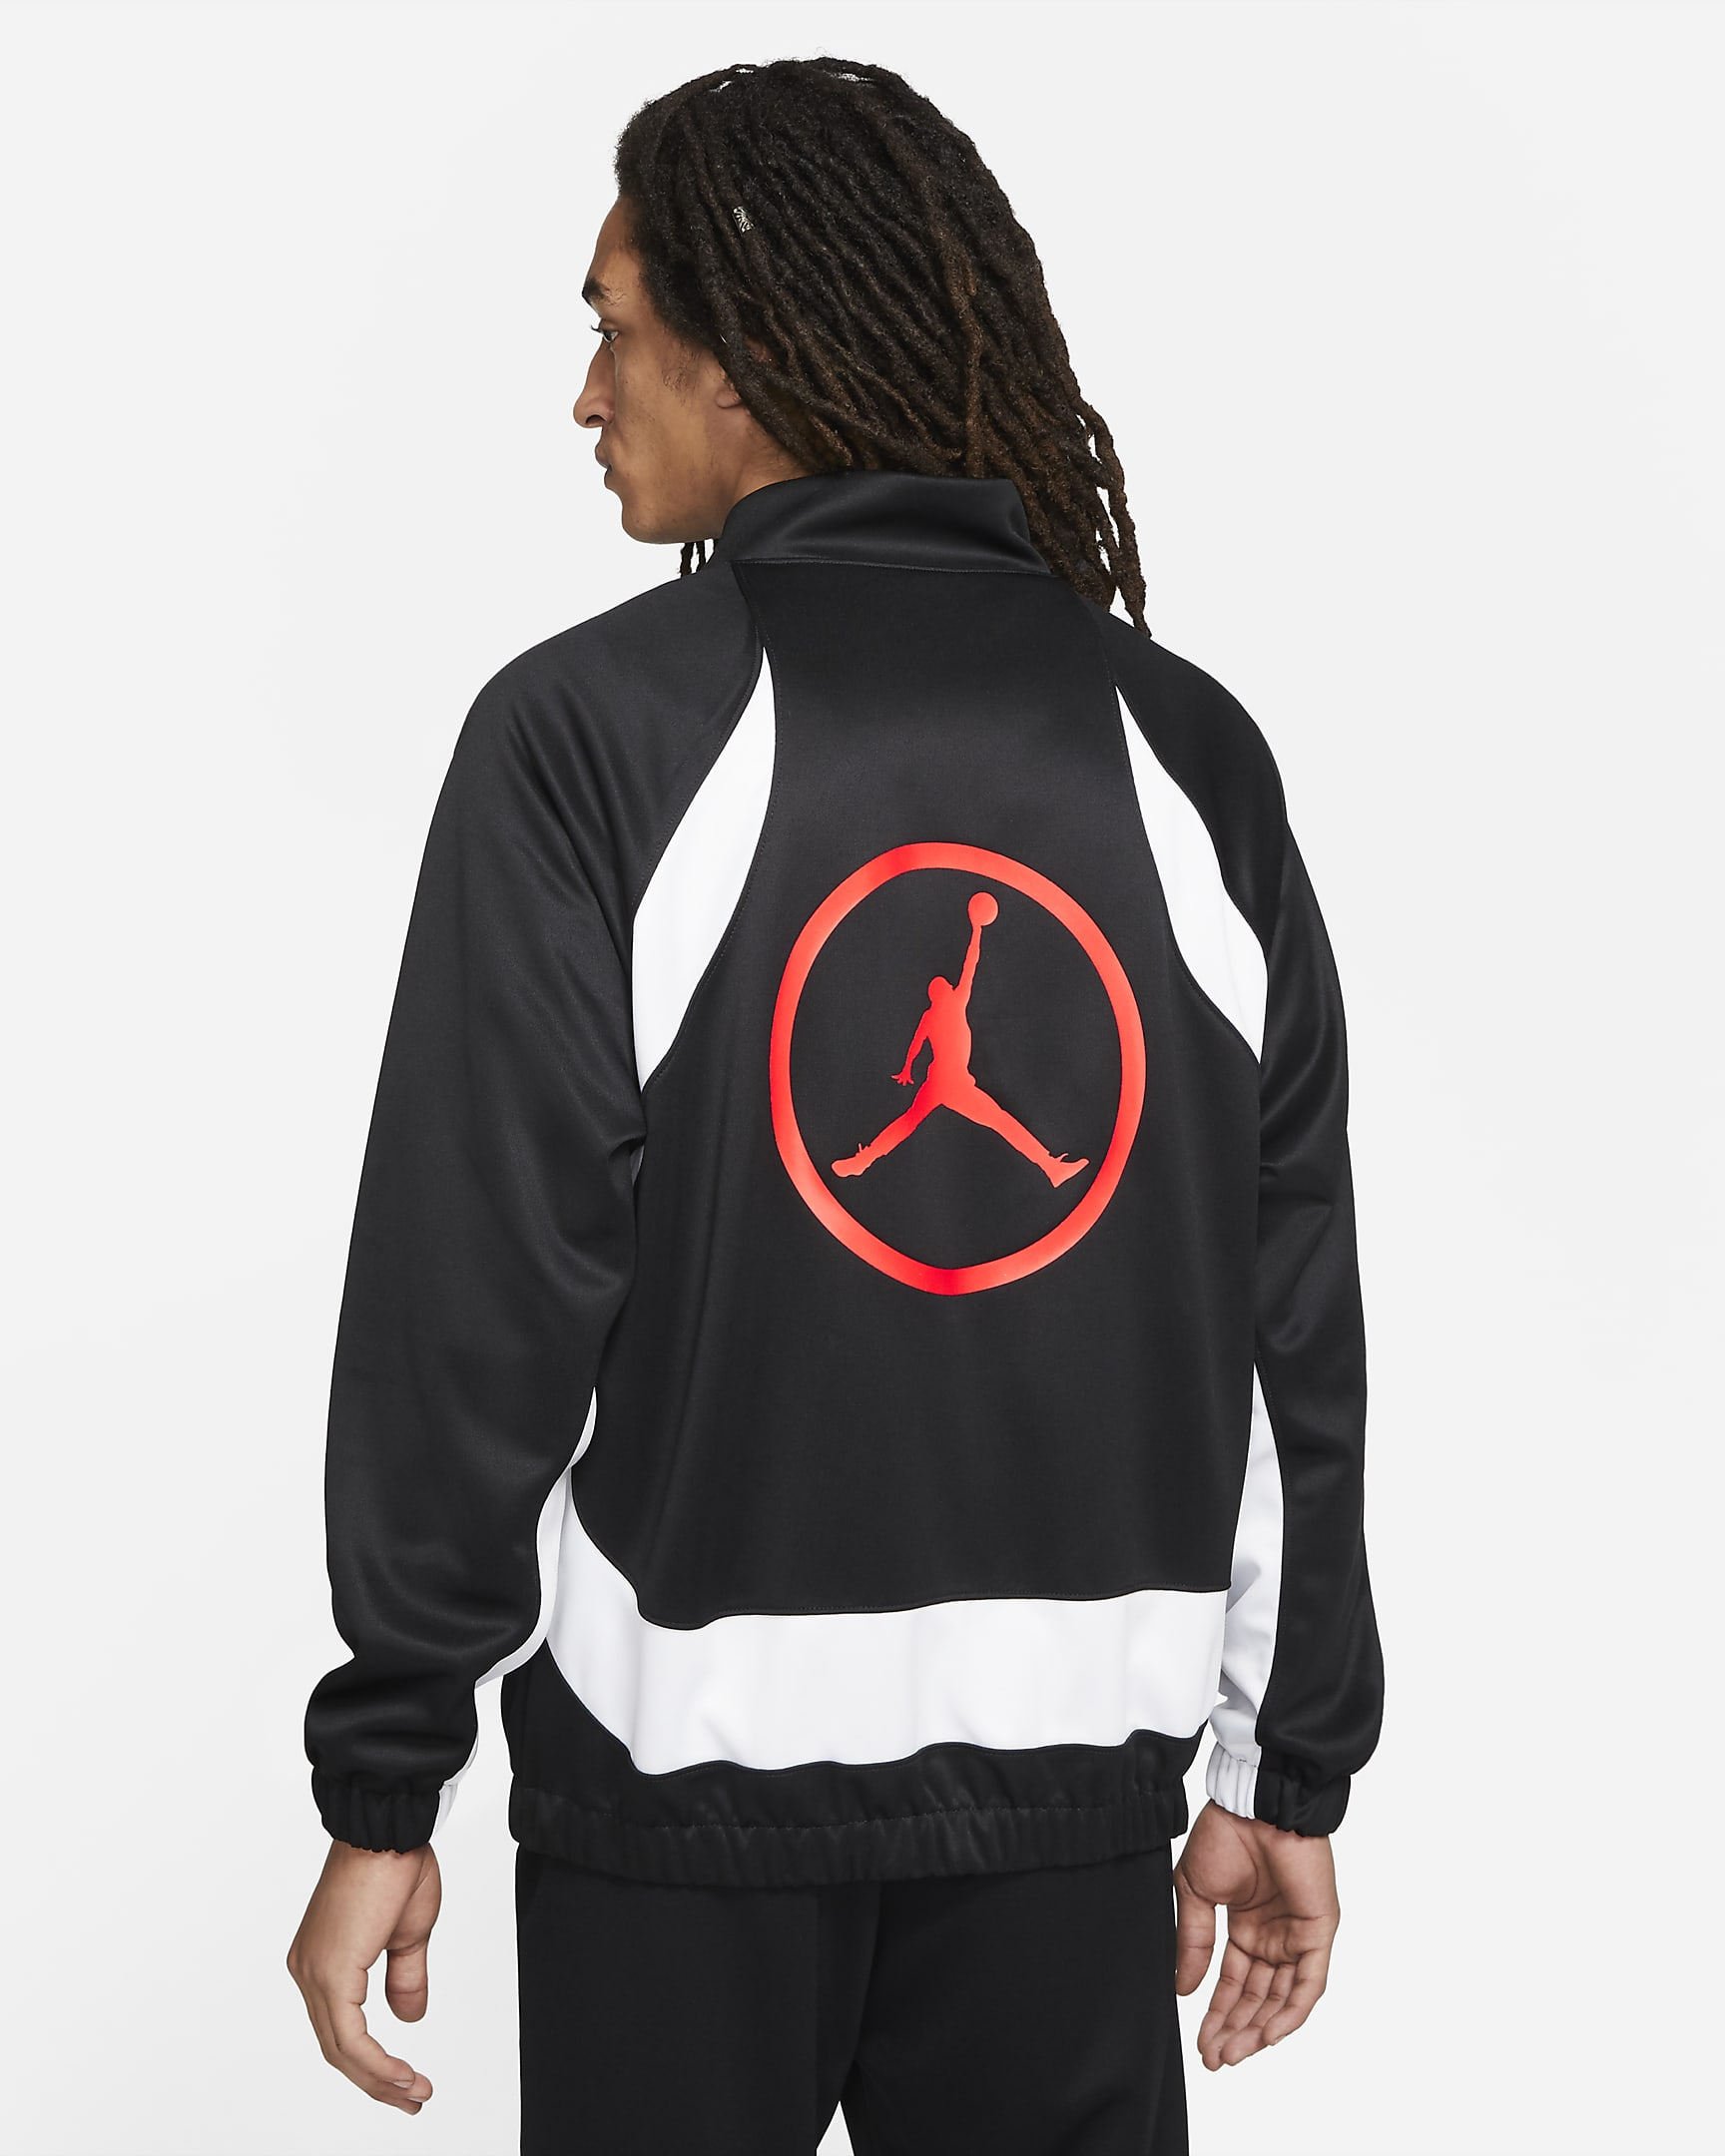 jordan-sport-dna-mens-hbr-jacket-M9n75C-1